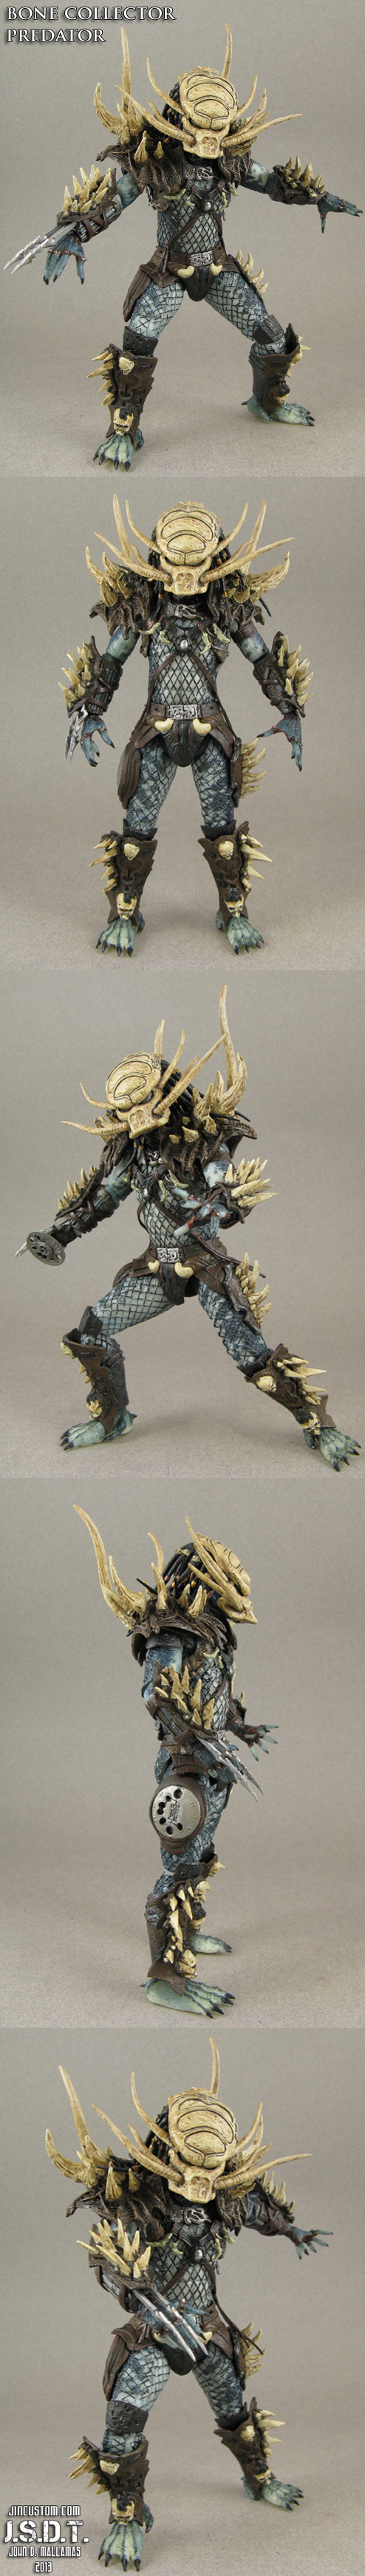 Custom Bone Collector NECA Predator figure by Jin-Saotome